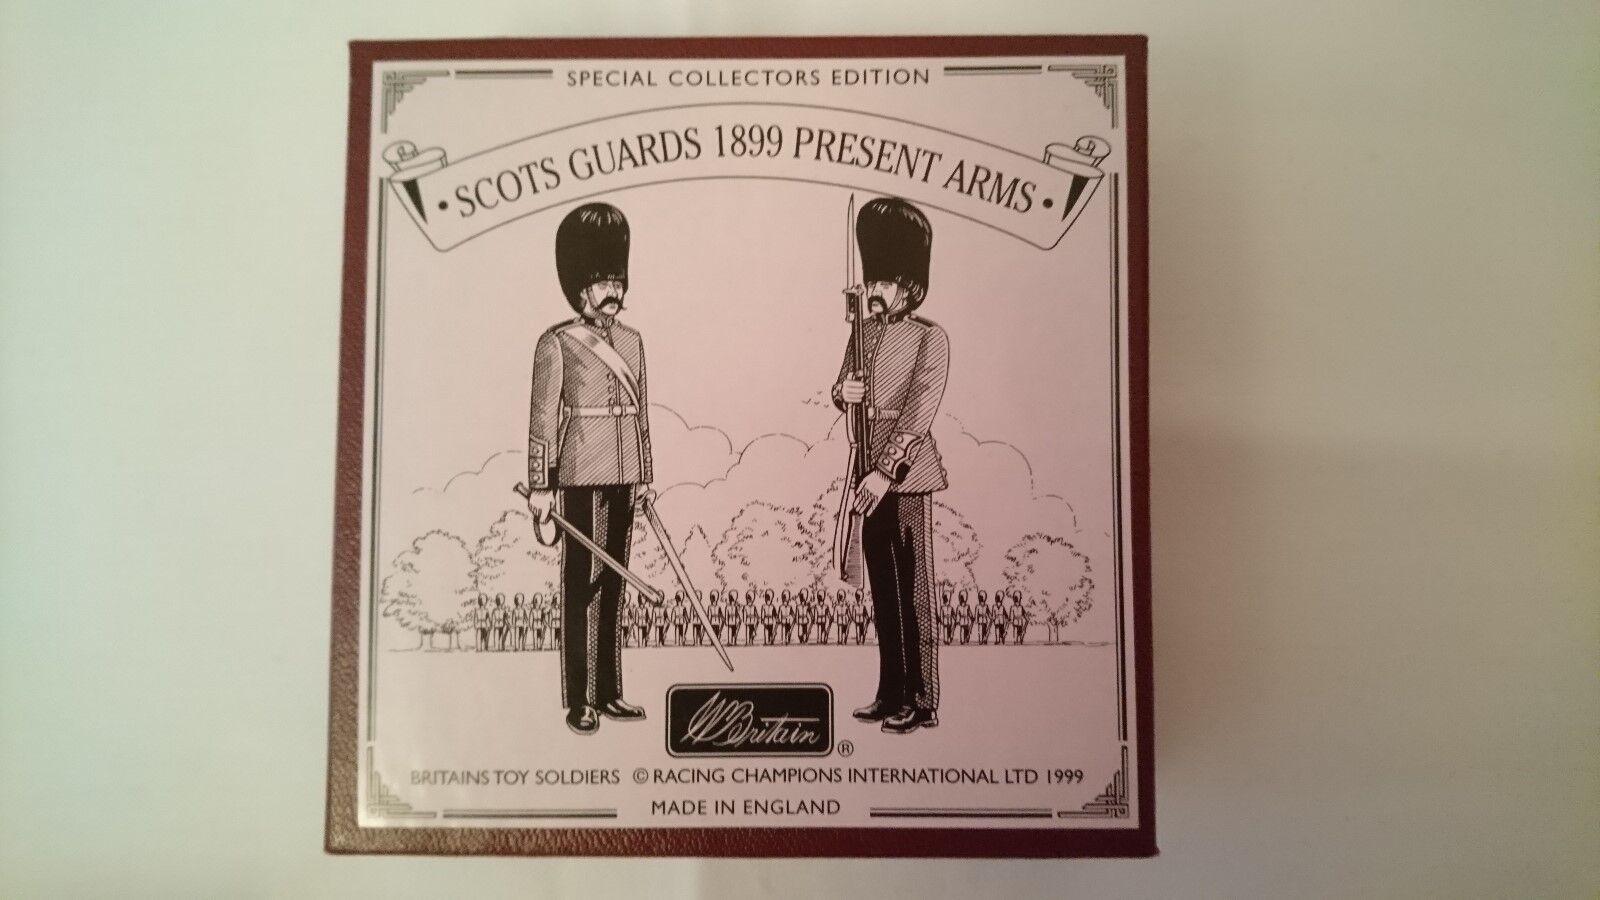 Britains Scot Guards 1899 Present ArmsSpecial Collectors Edition No. 00256.